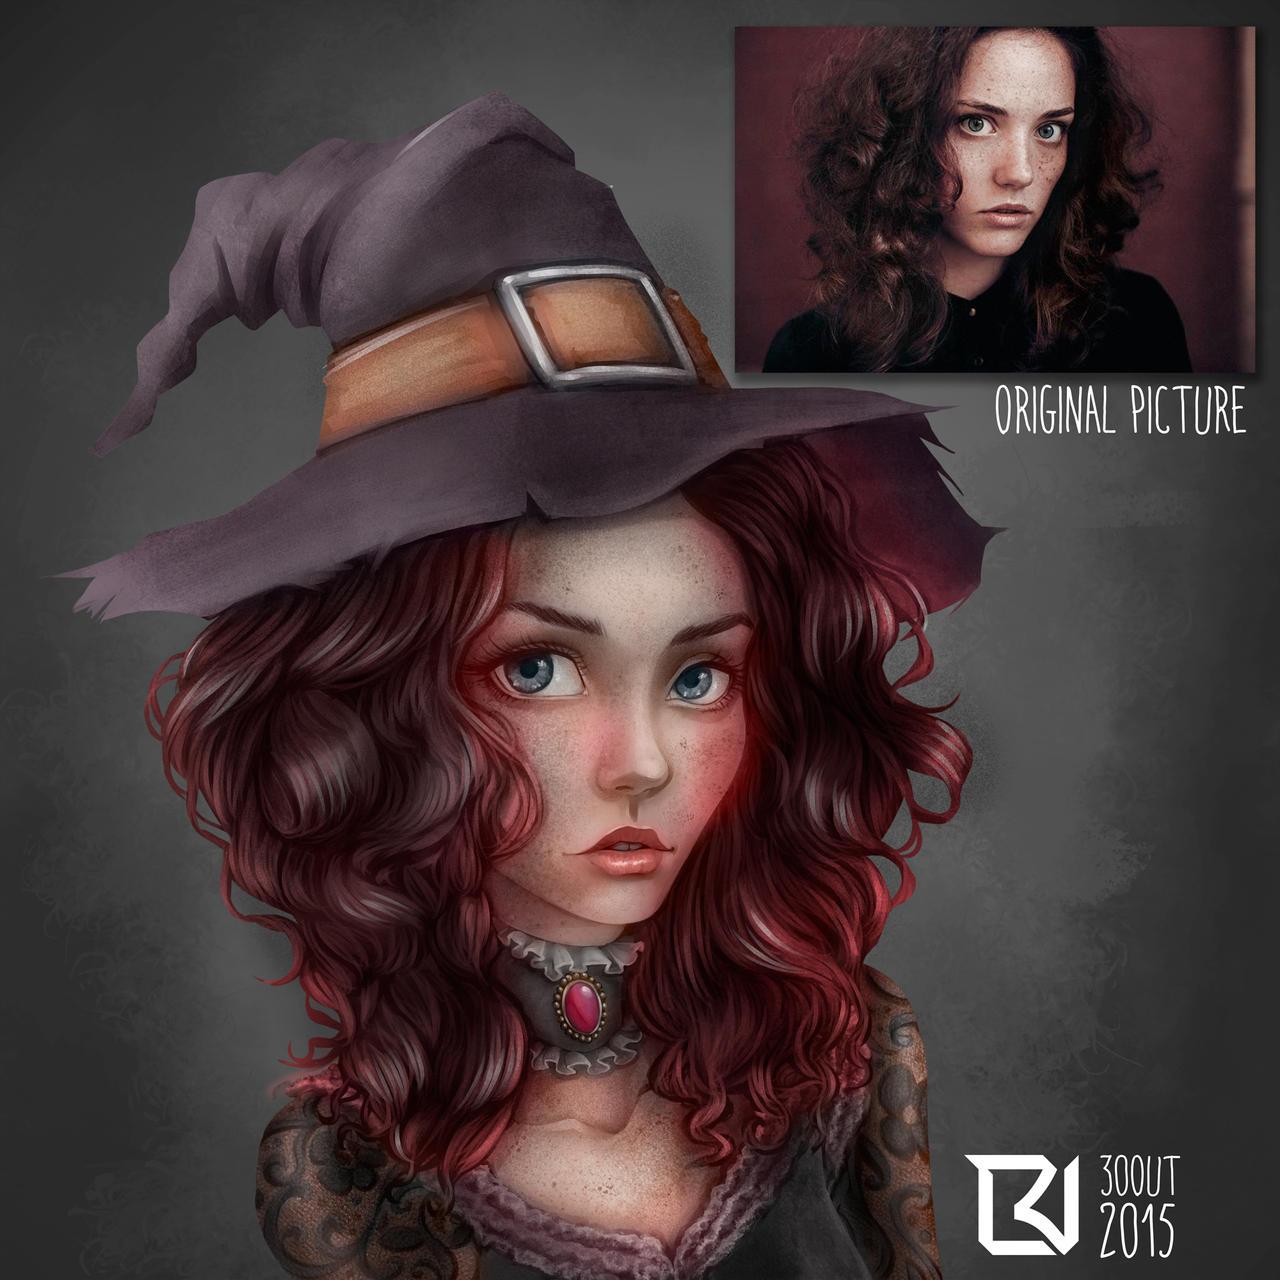 Witch - Picture Study #2 by LuizRaffaello